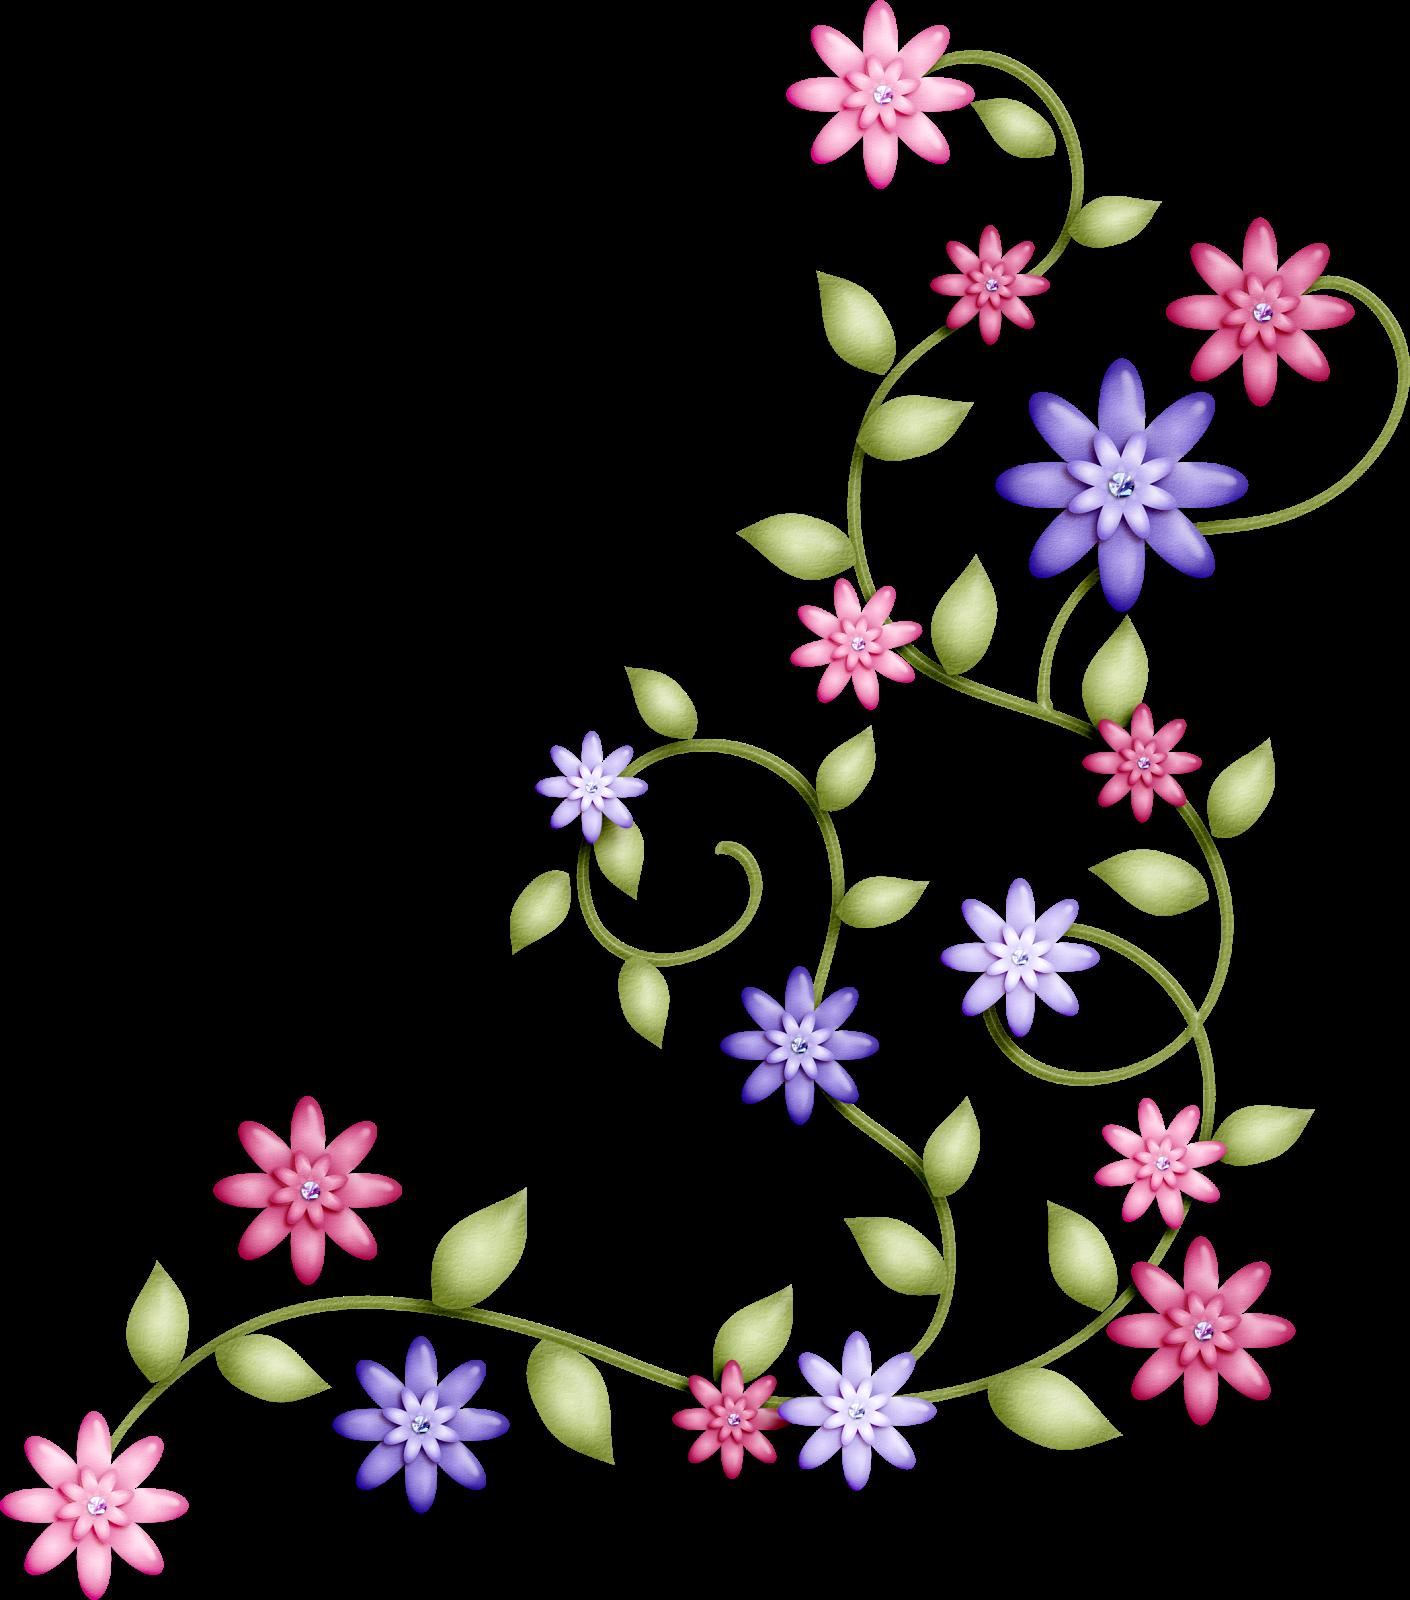 Imagenes de flores en caricatura Imagui